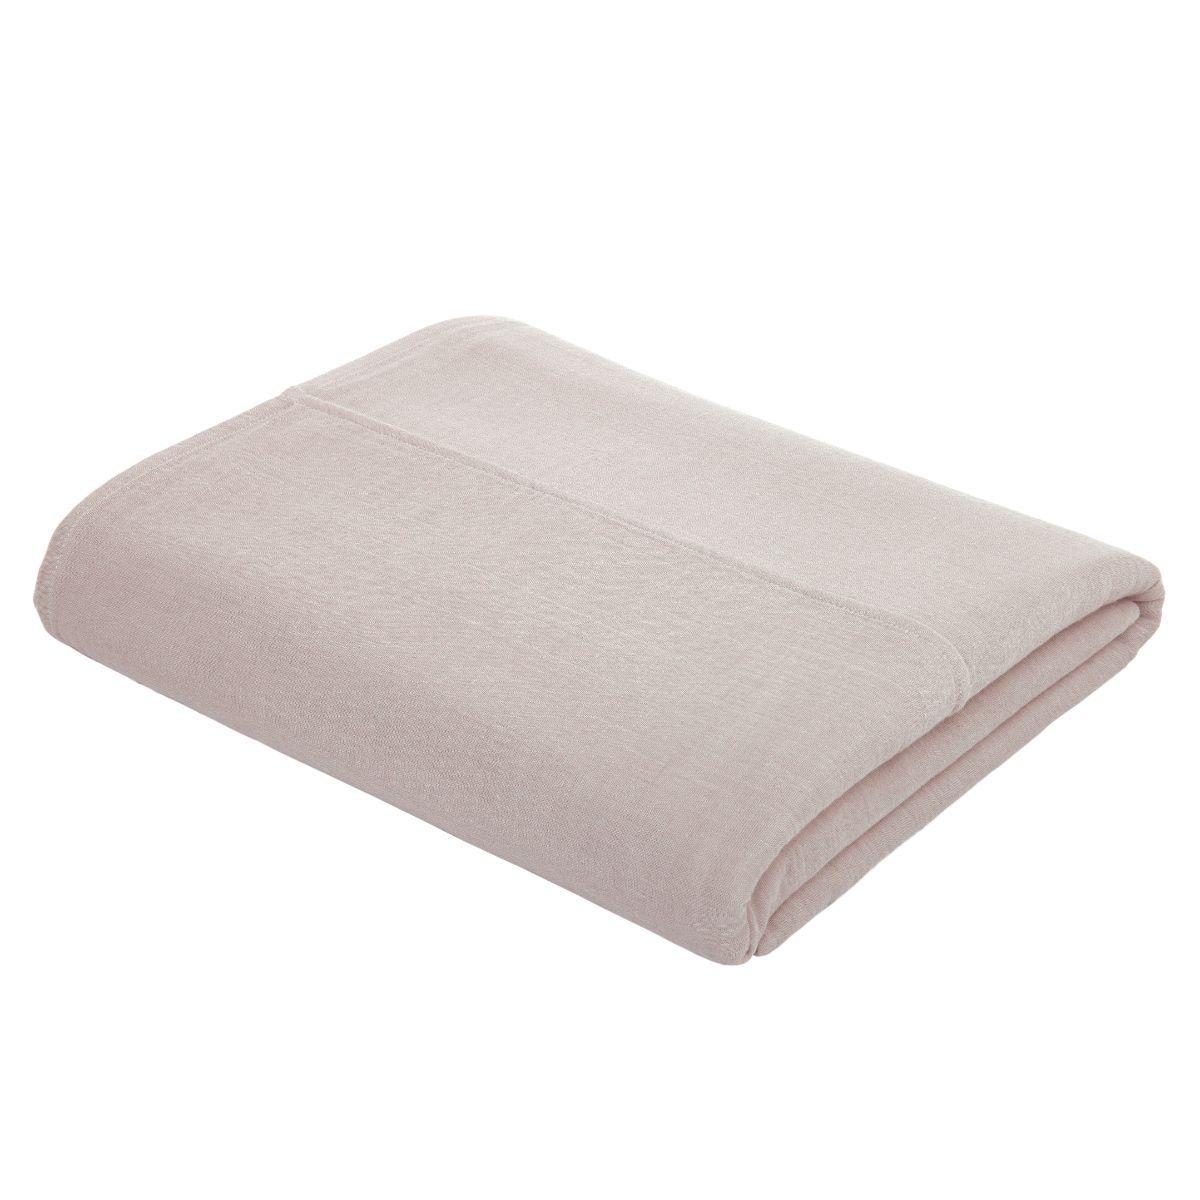 Numero 74 Top flat Sheet Plain powder